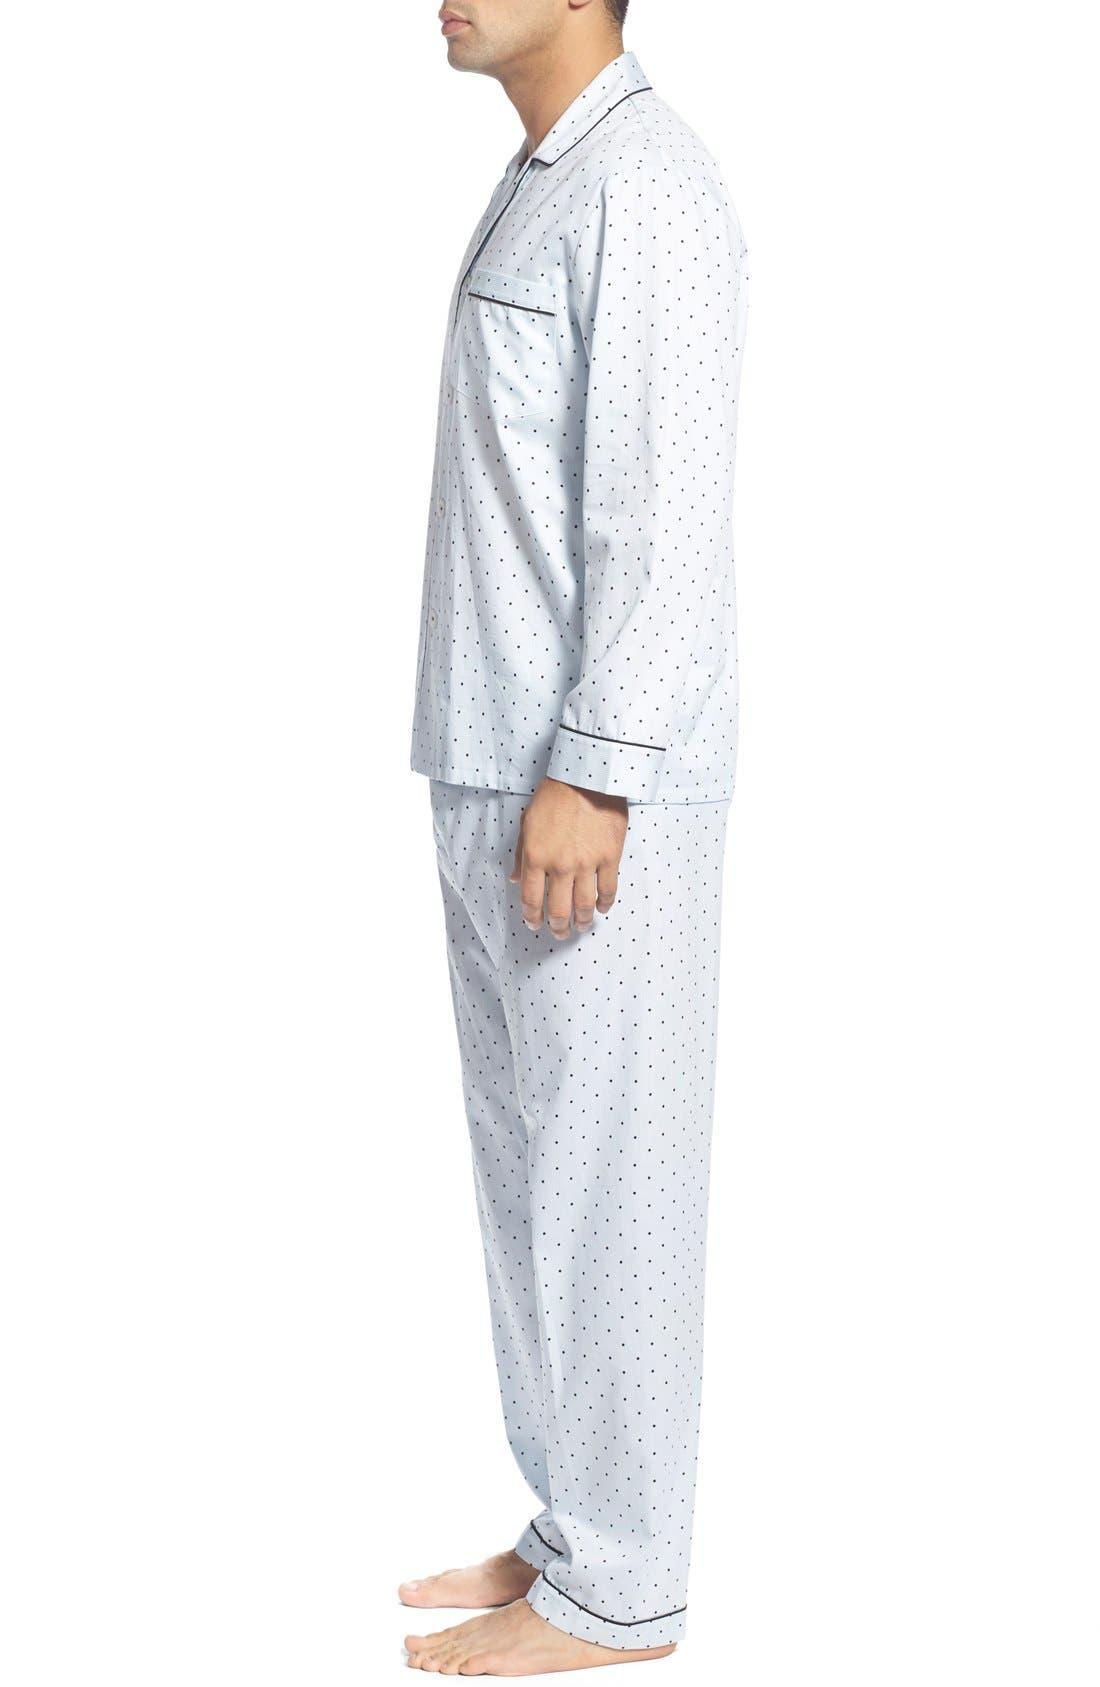 'Twilight' Cotton Pajamas,                             Alternate thumbnail 3, color,                             400